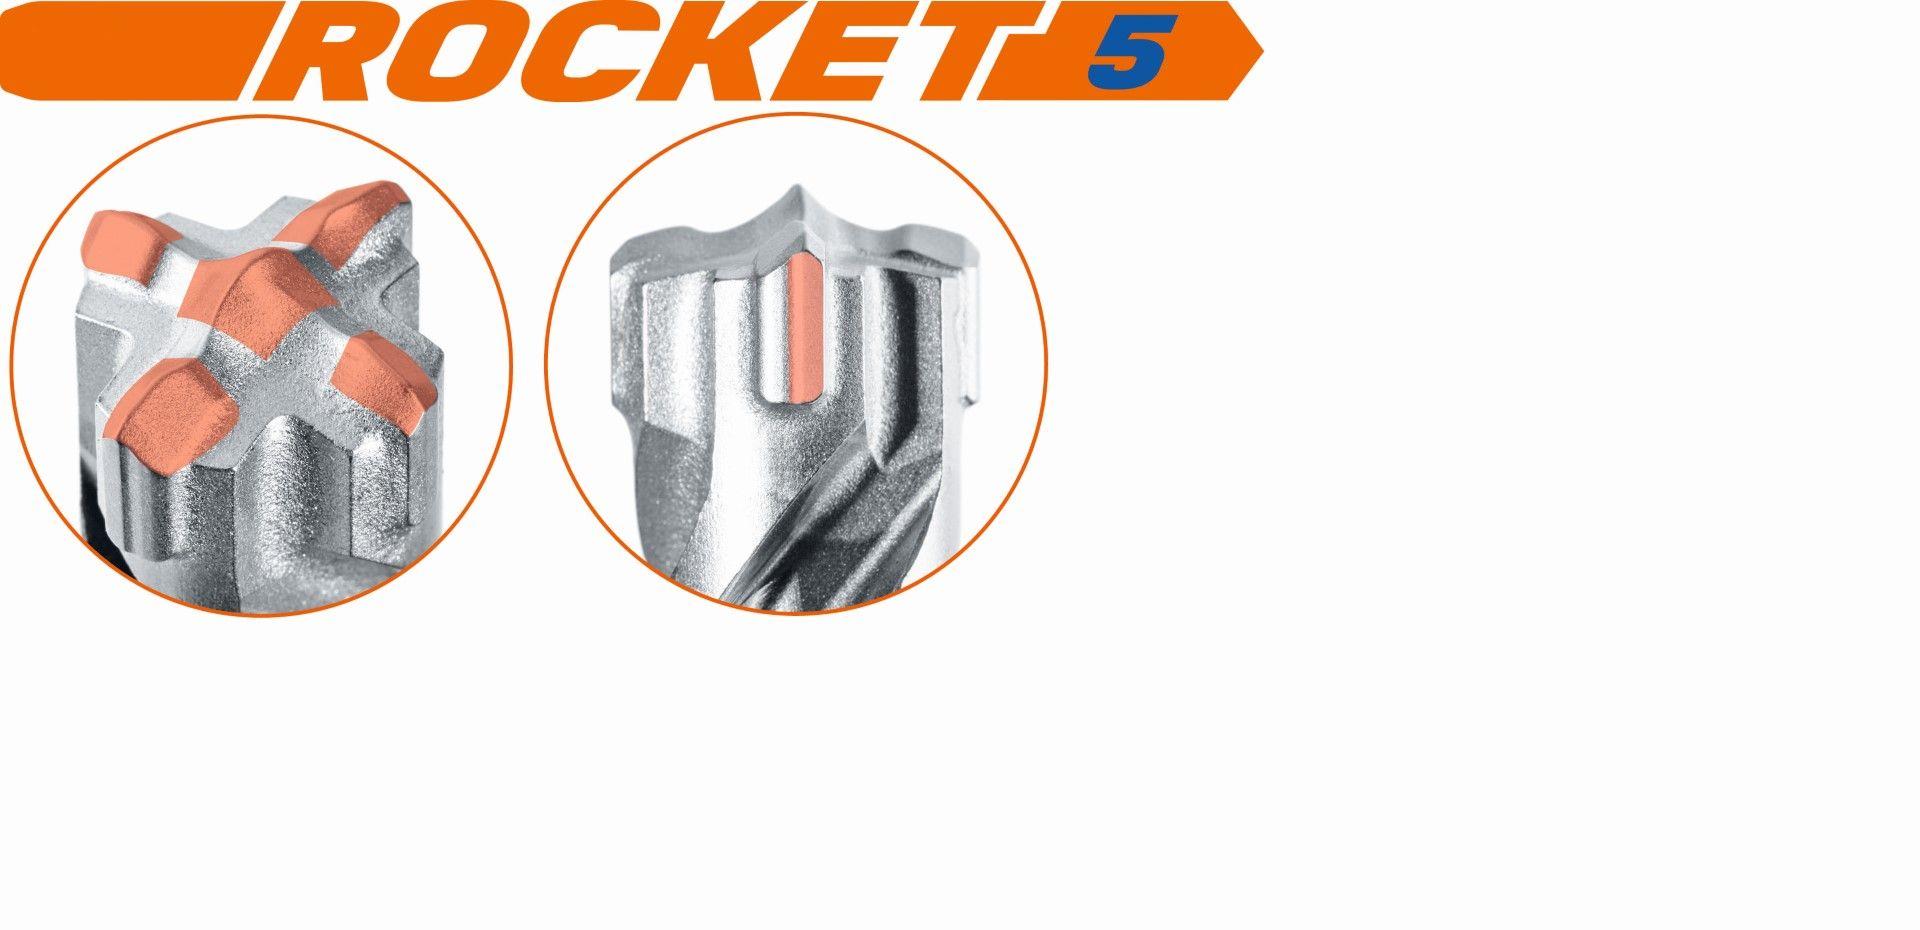 Slika BORER Rocket 5 SDS-plus 5x160 mm 4 kraka